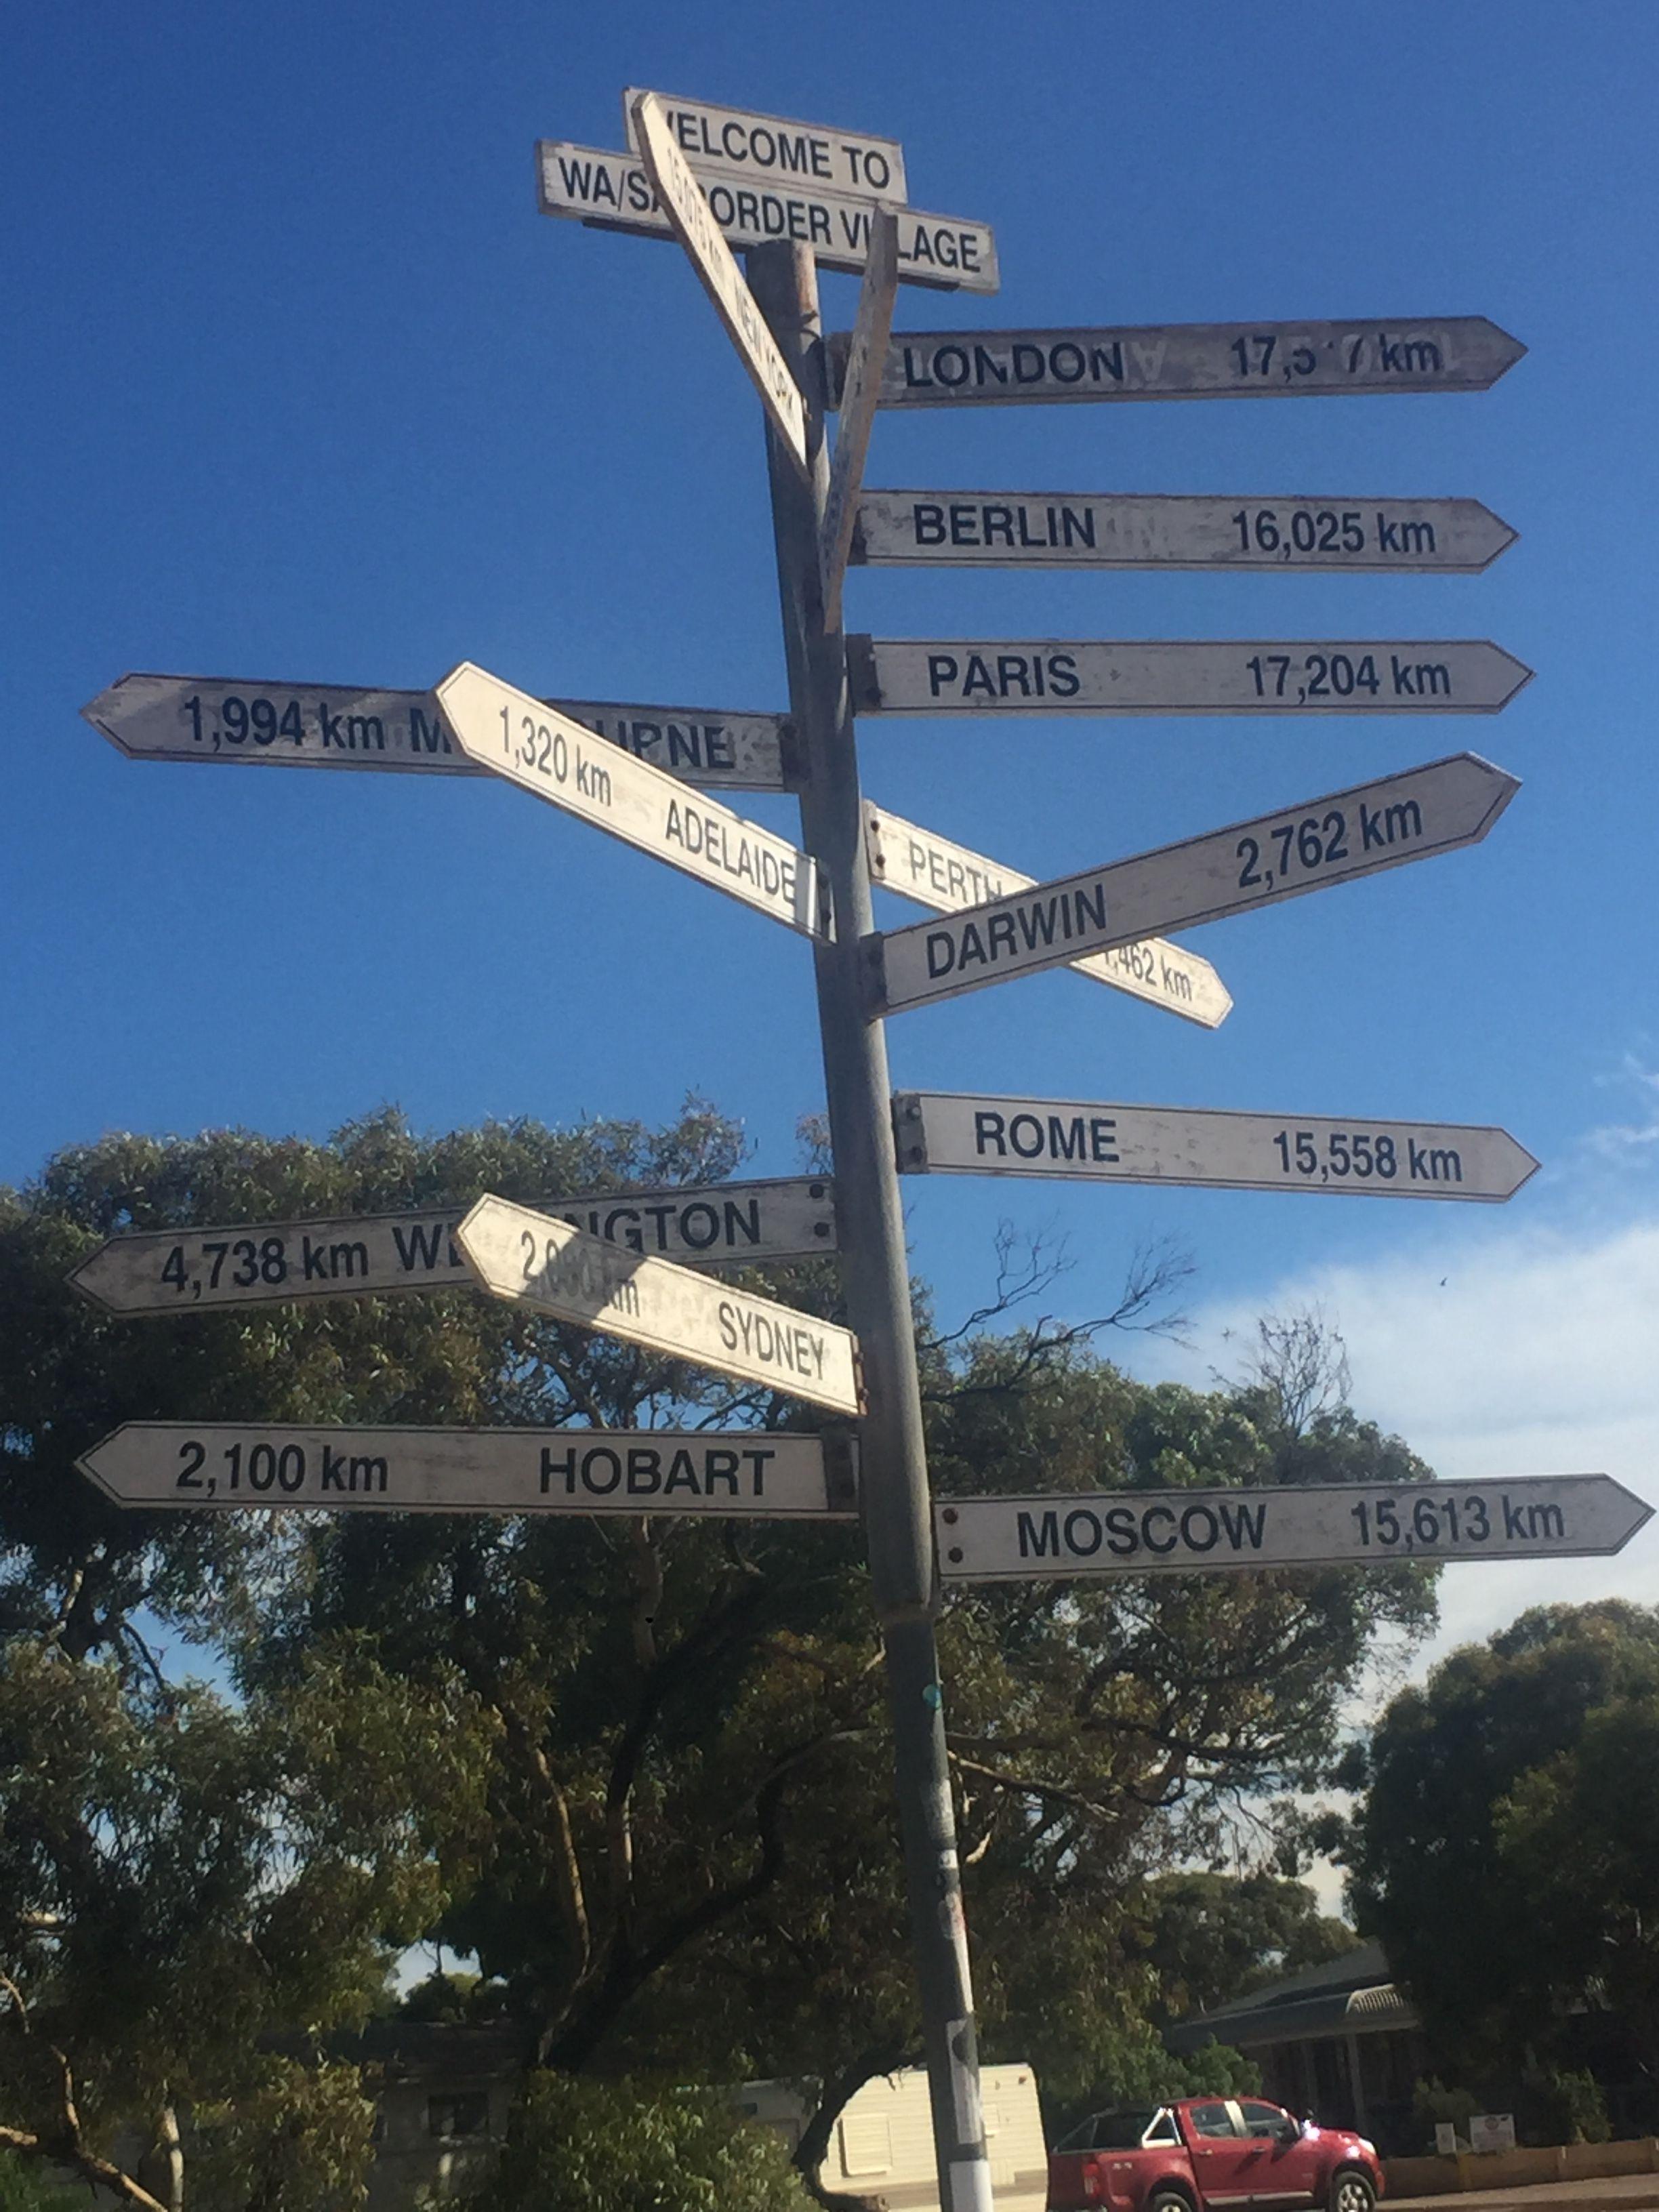 Pin by Tonia Reeves on Travelling Australia Australia